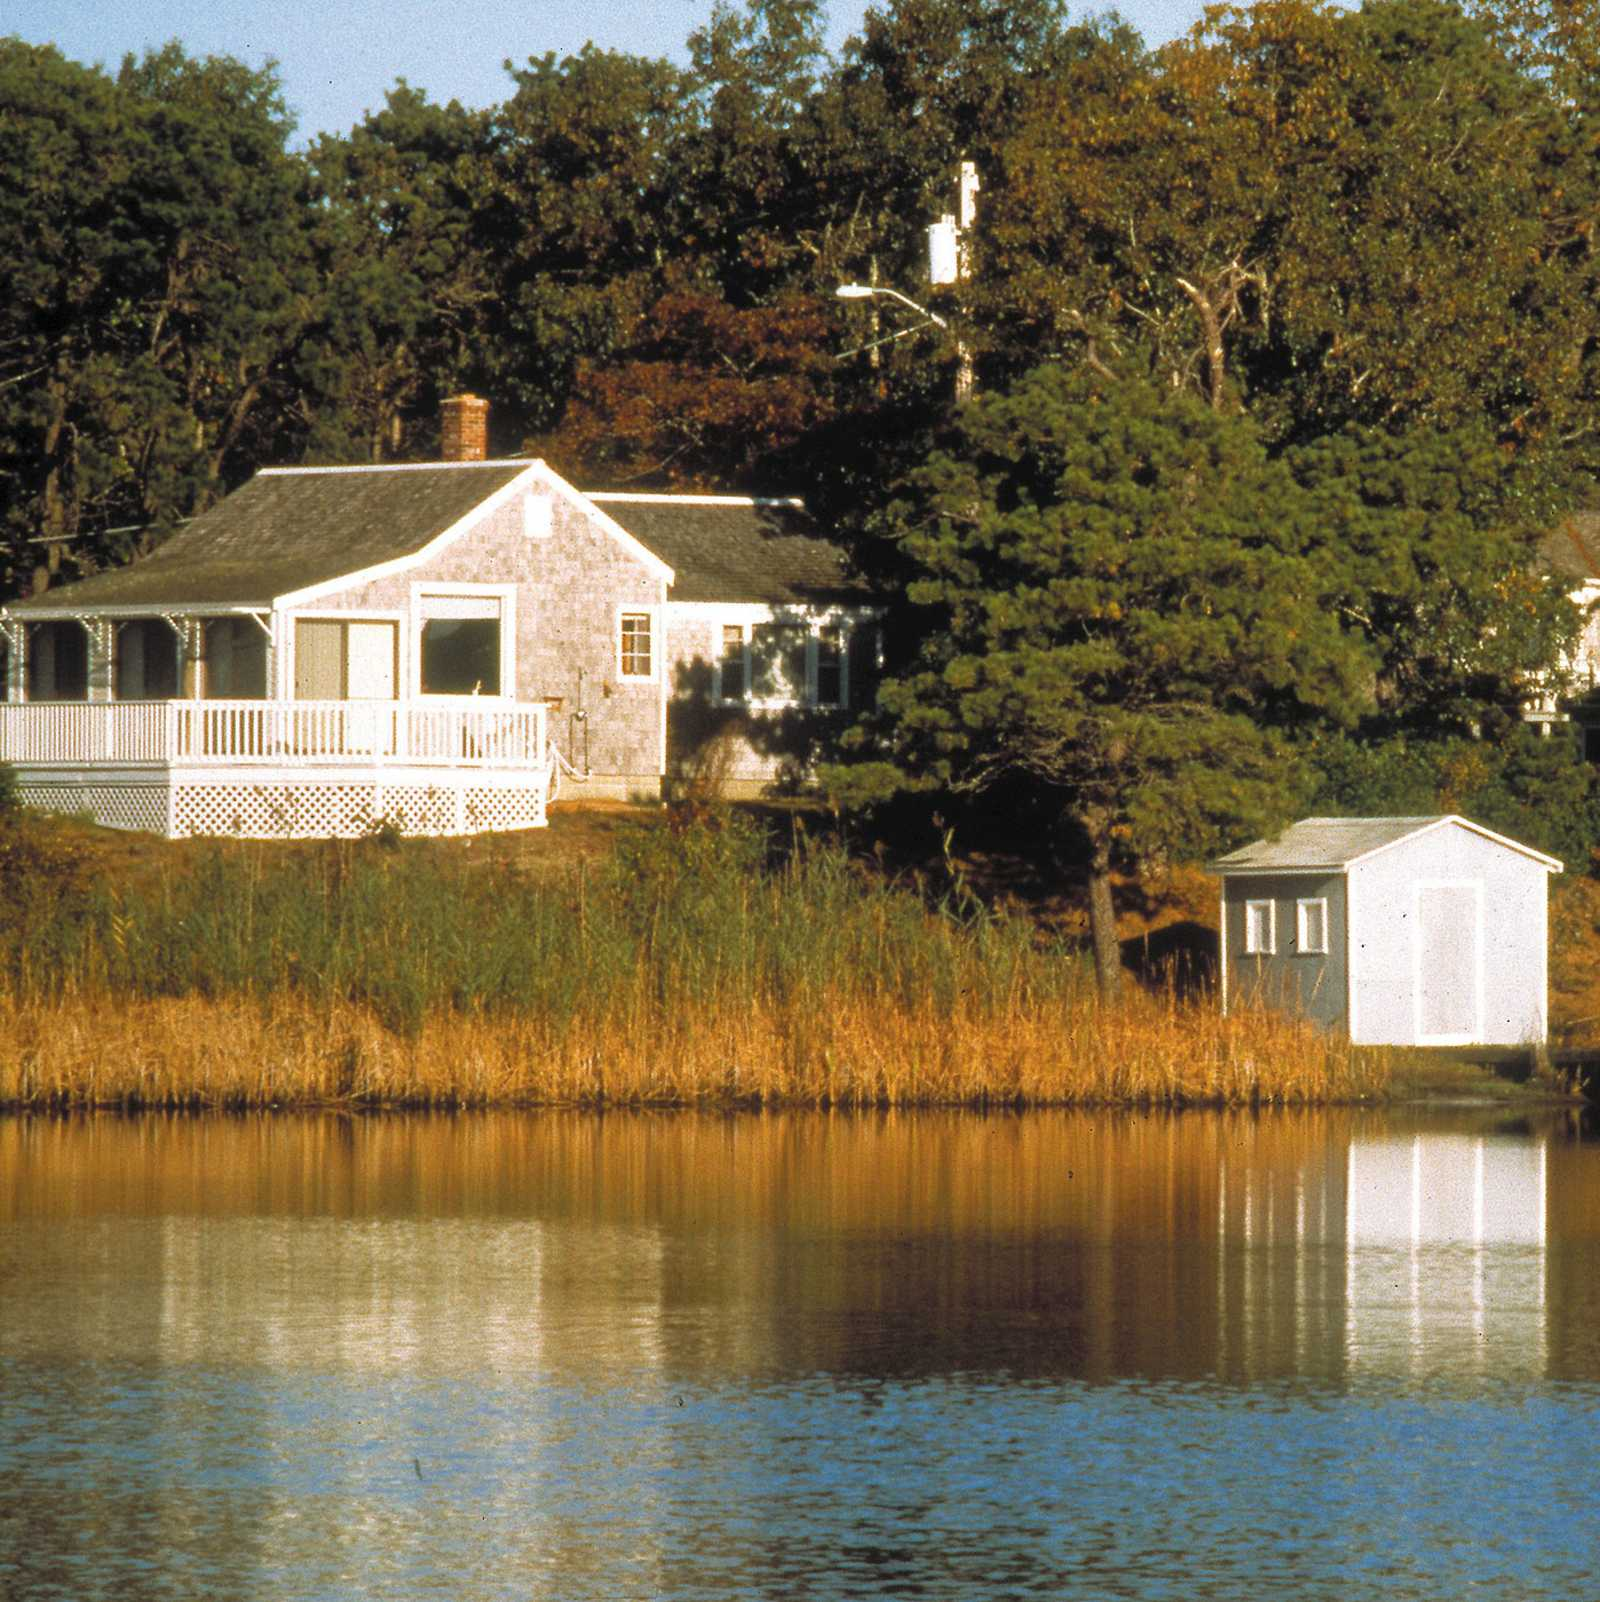 Hotel, Massachusetts: Harbor Village Cottages